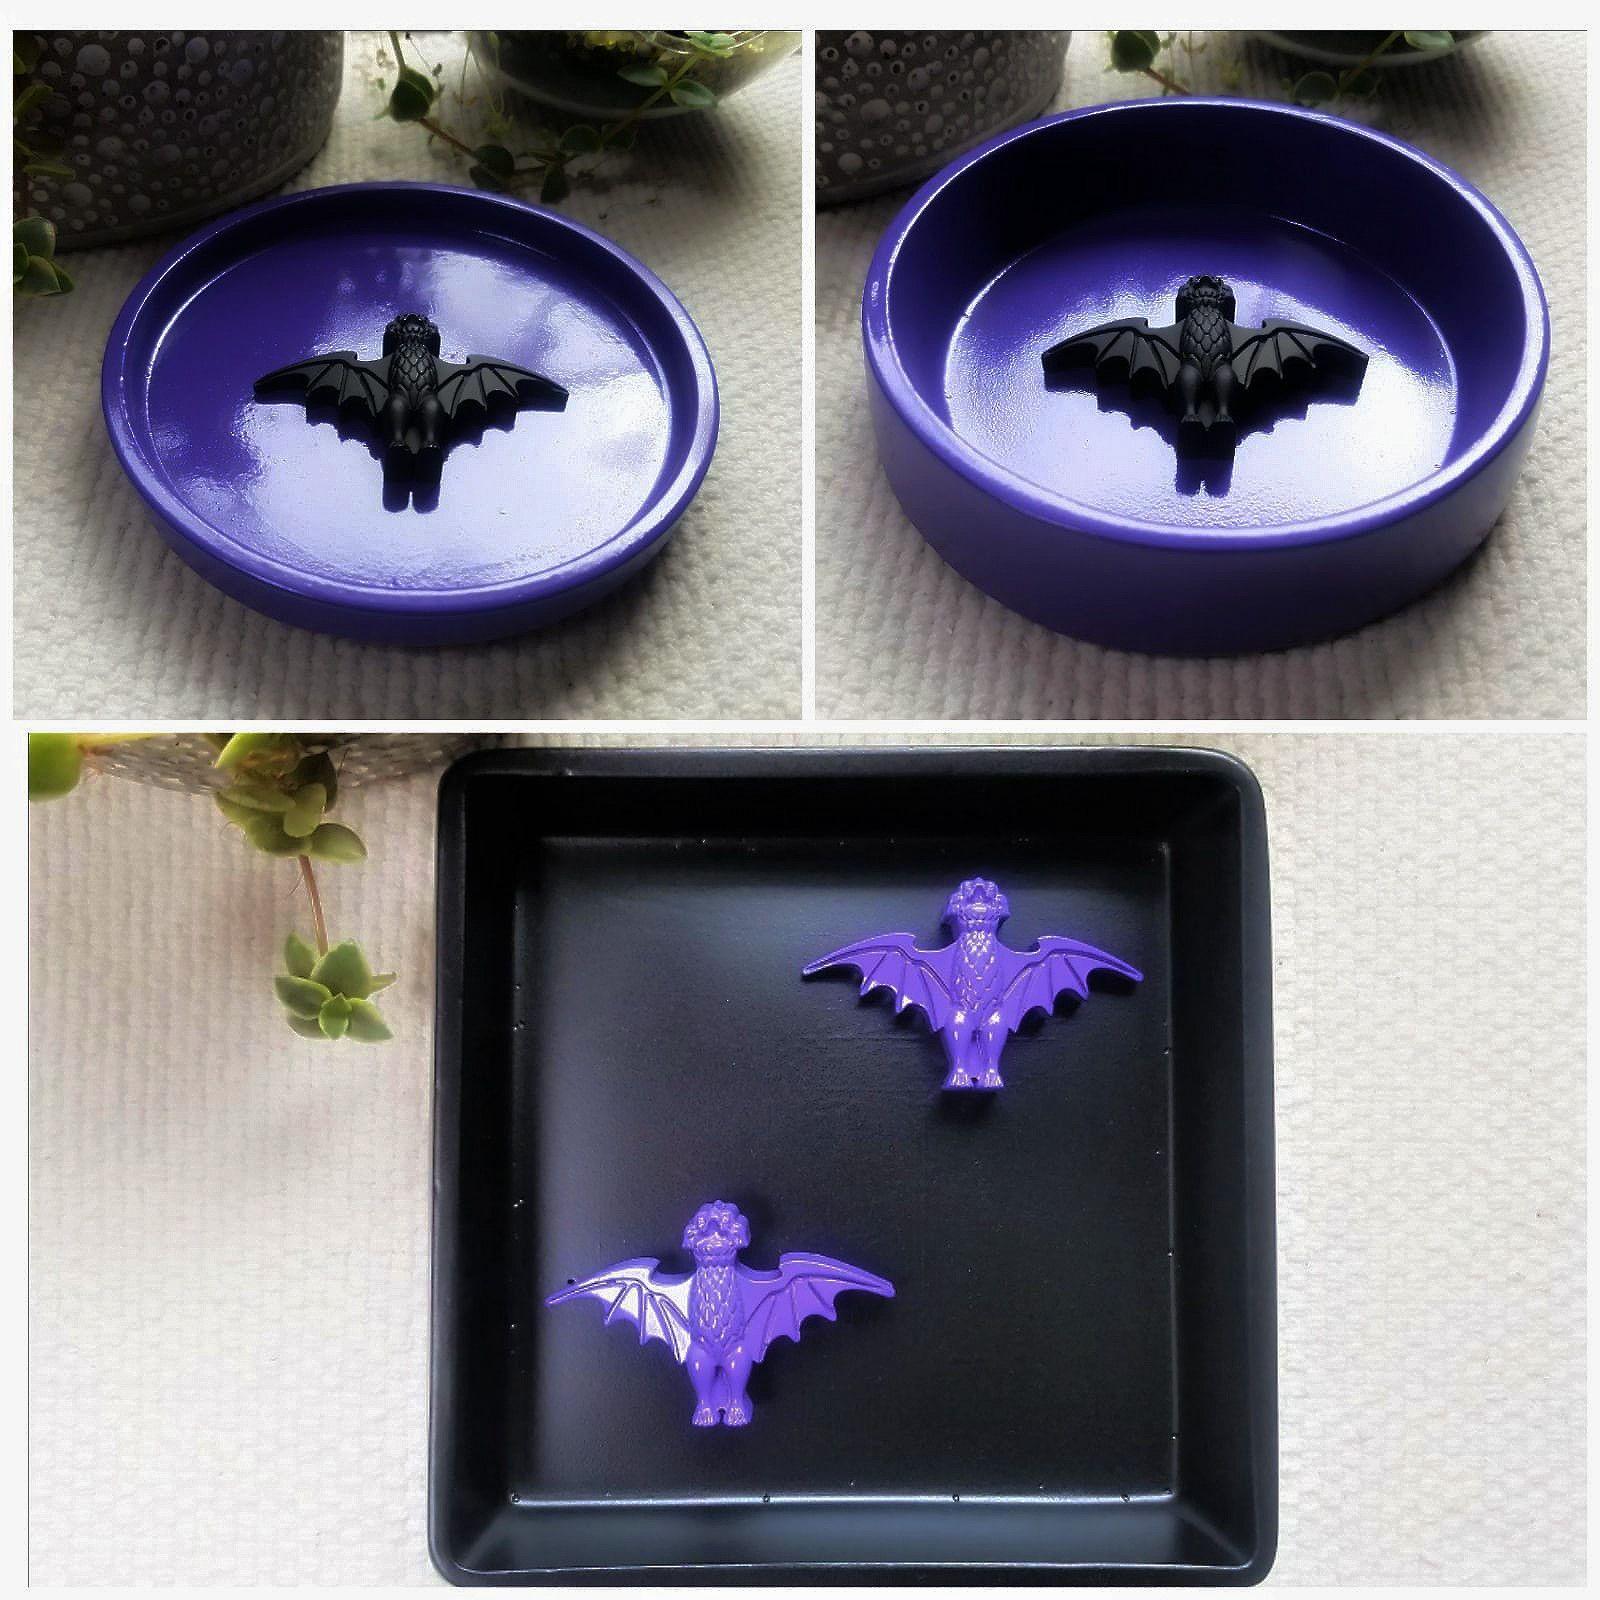 Disneyland Haunted Mansion Inspired Dish Disney themed engagement dish Ring Dish Bat Dish Haunted mansion wedding gift